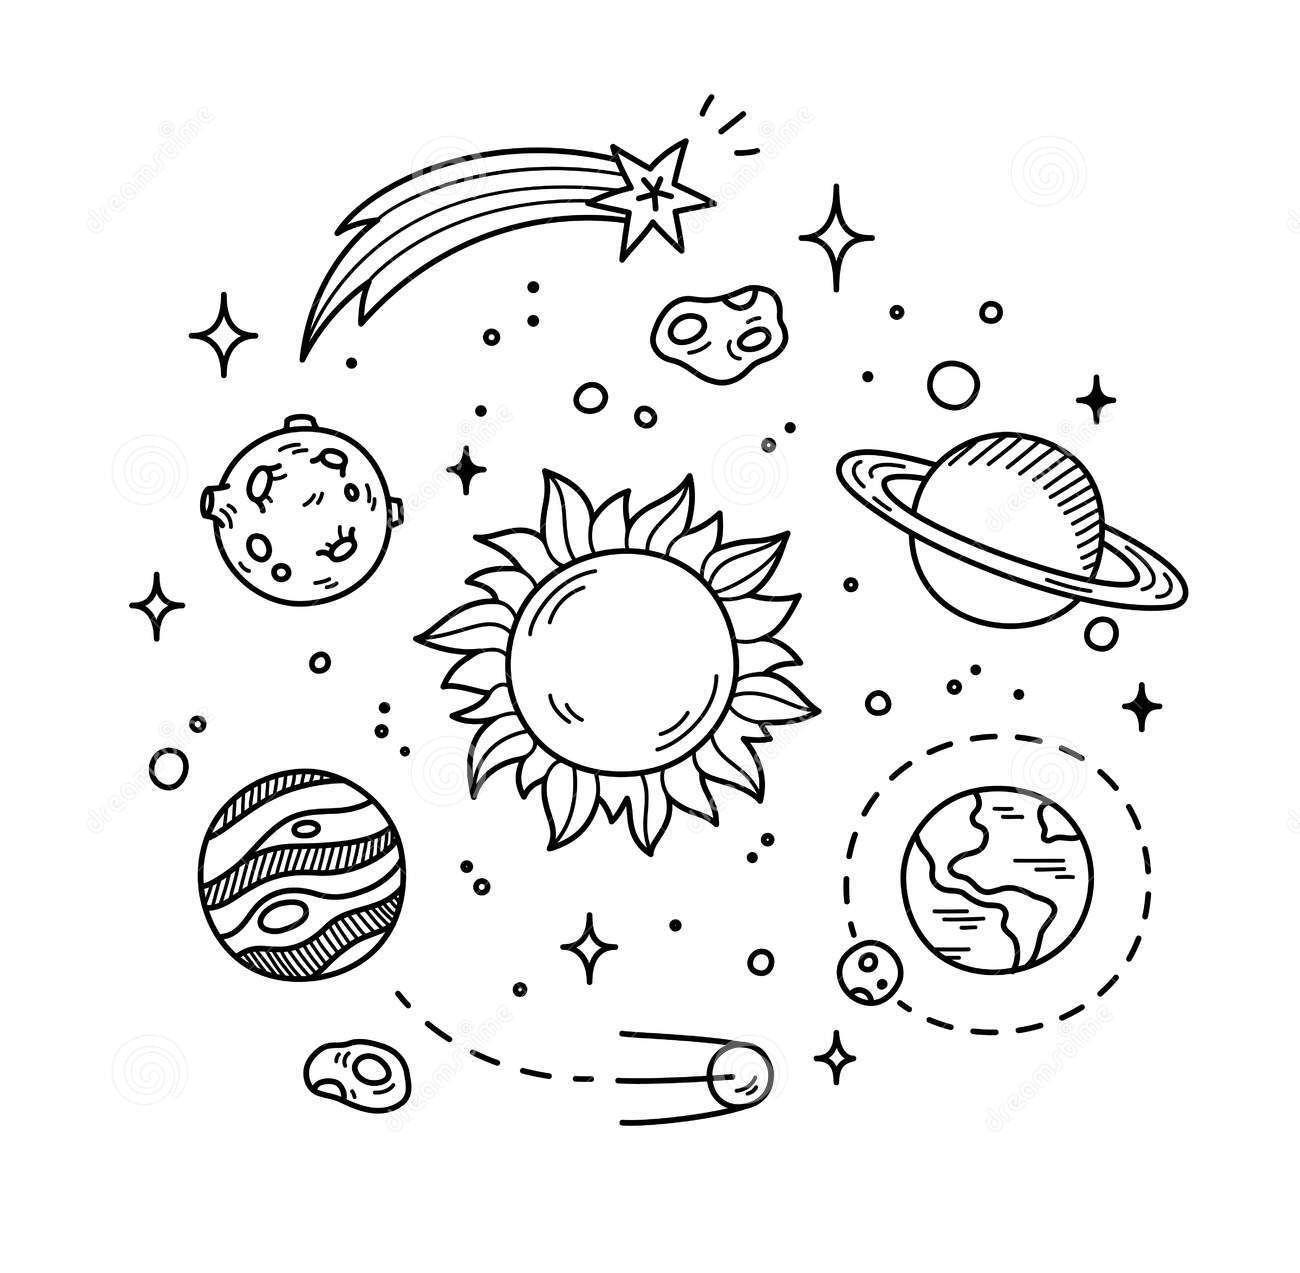 Moon Doodles Art Pinterest Arte Dibujos And Dibujos Tumblr